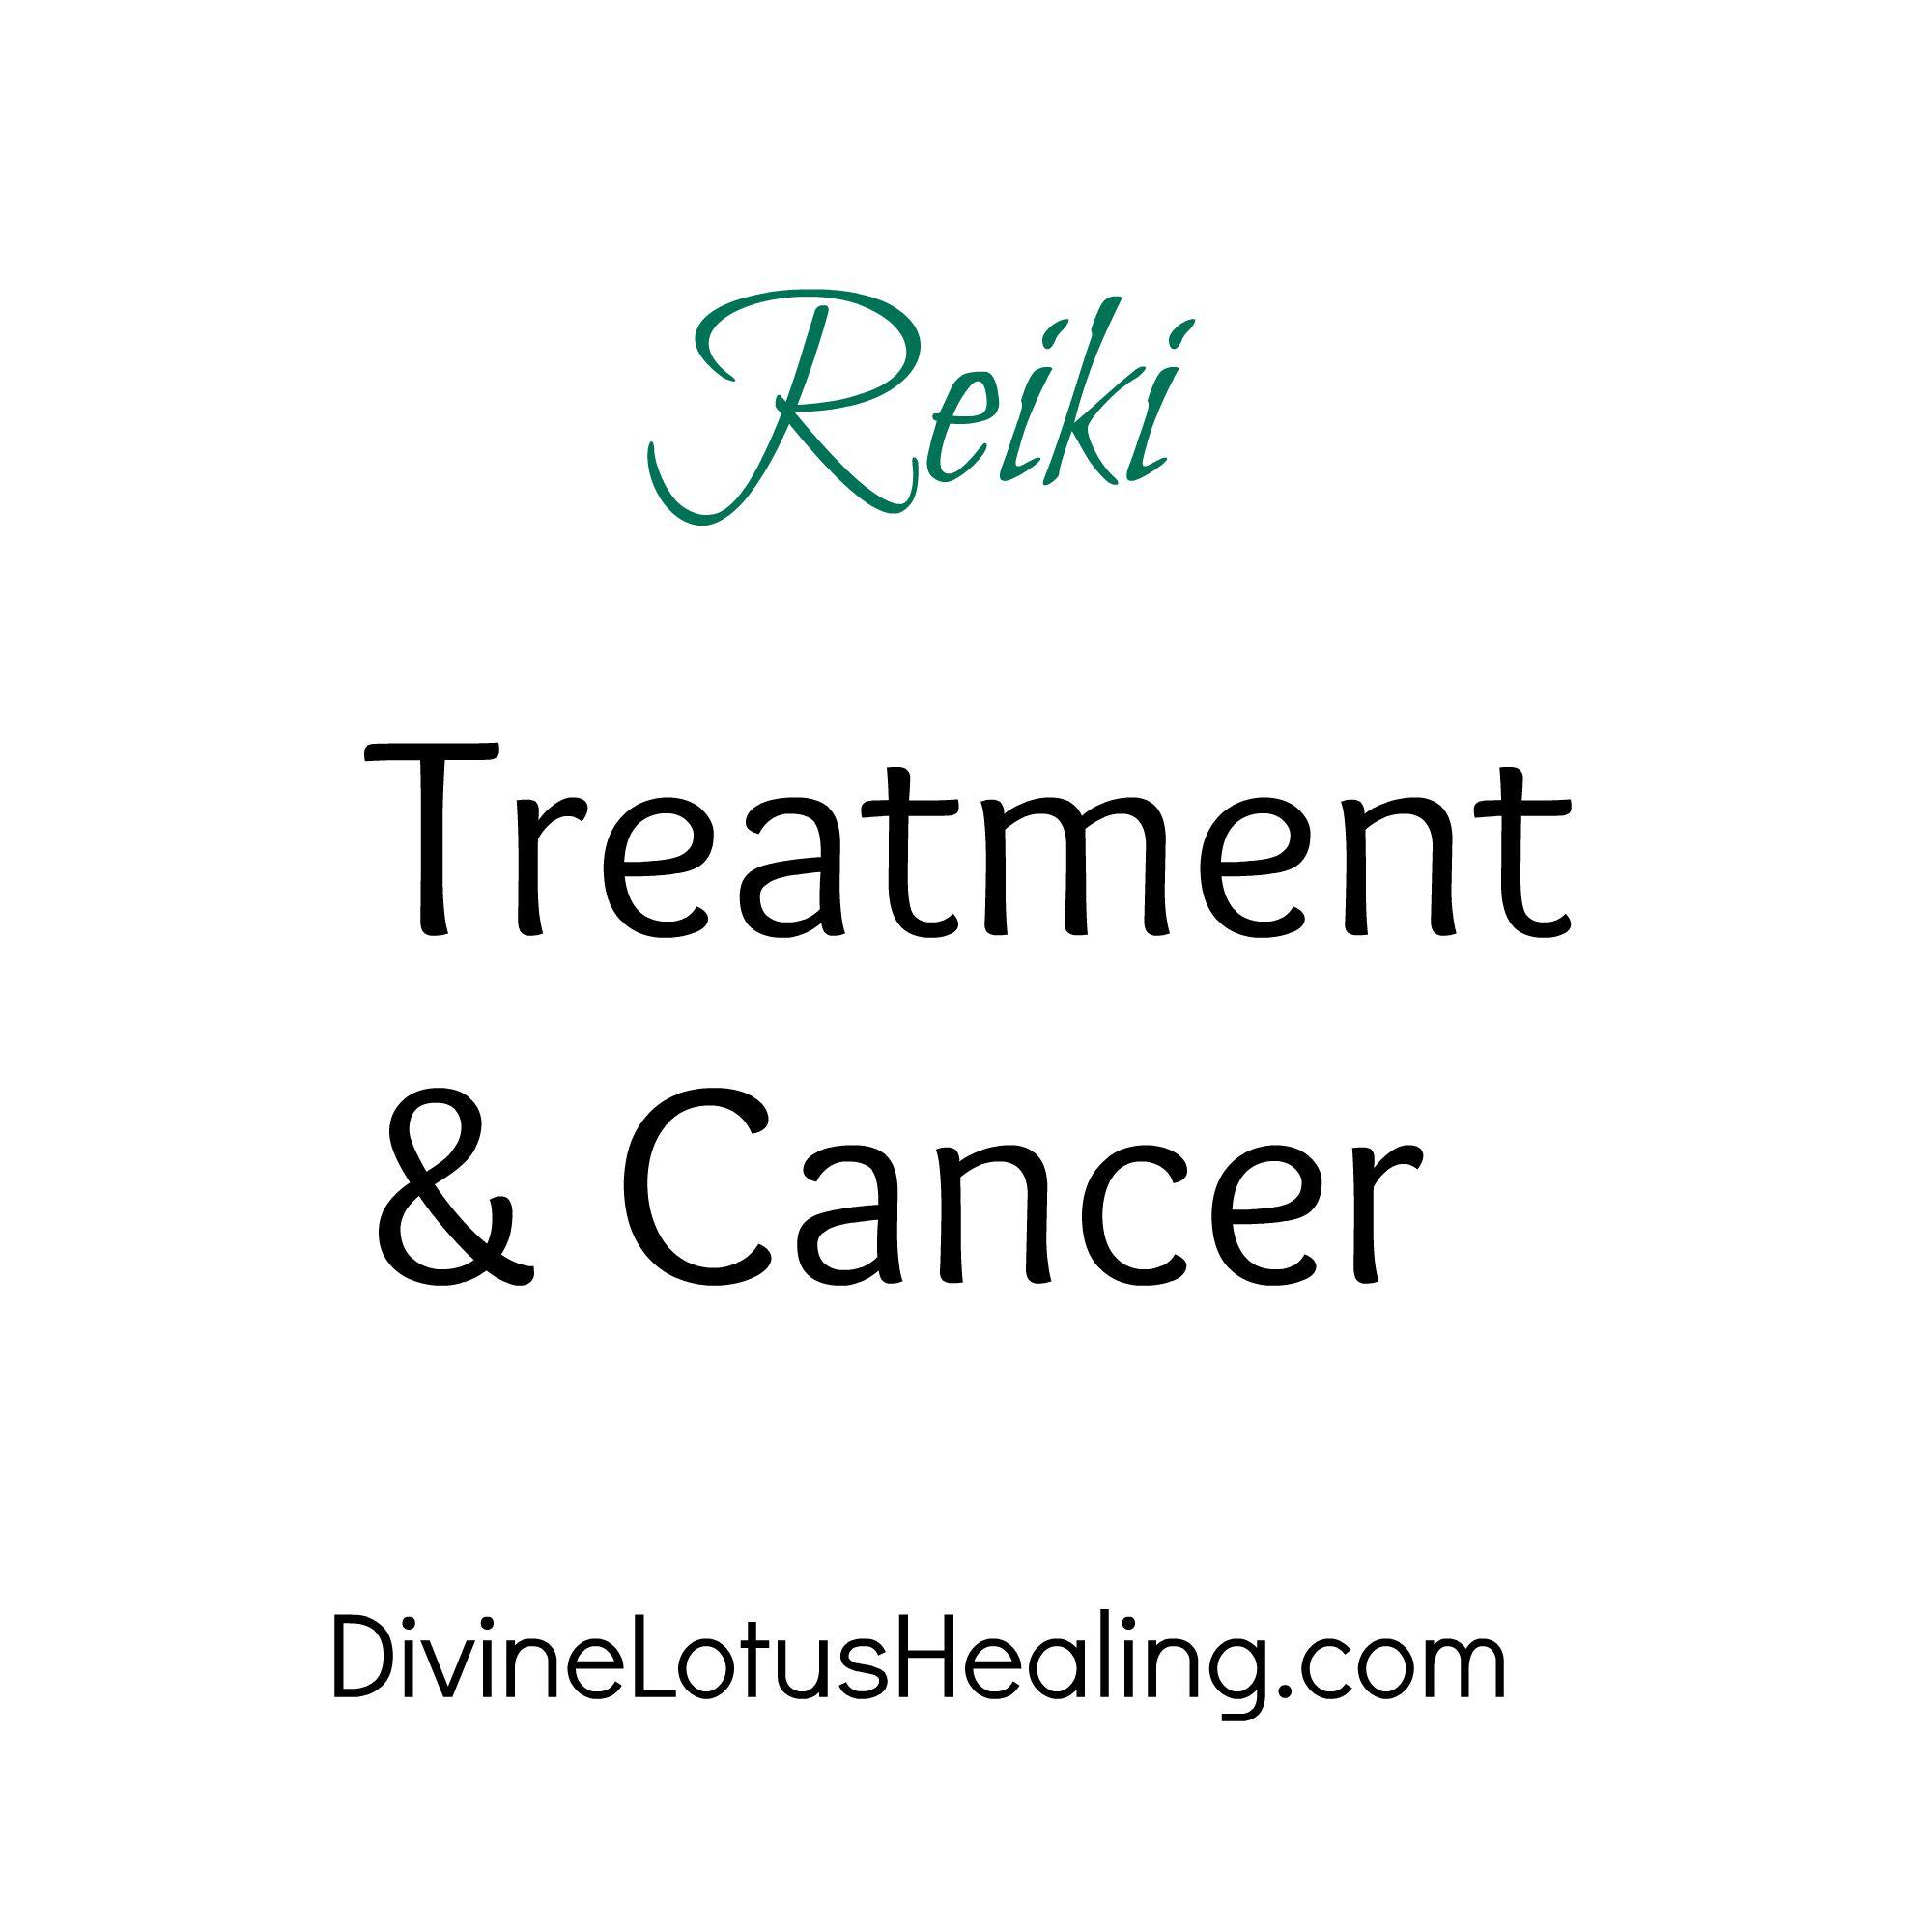 Divine Lotus Healing Reiki Treatment and Cancer